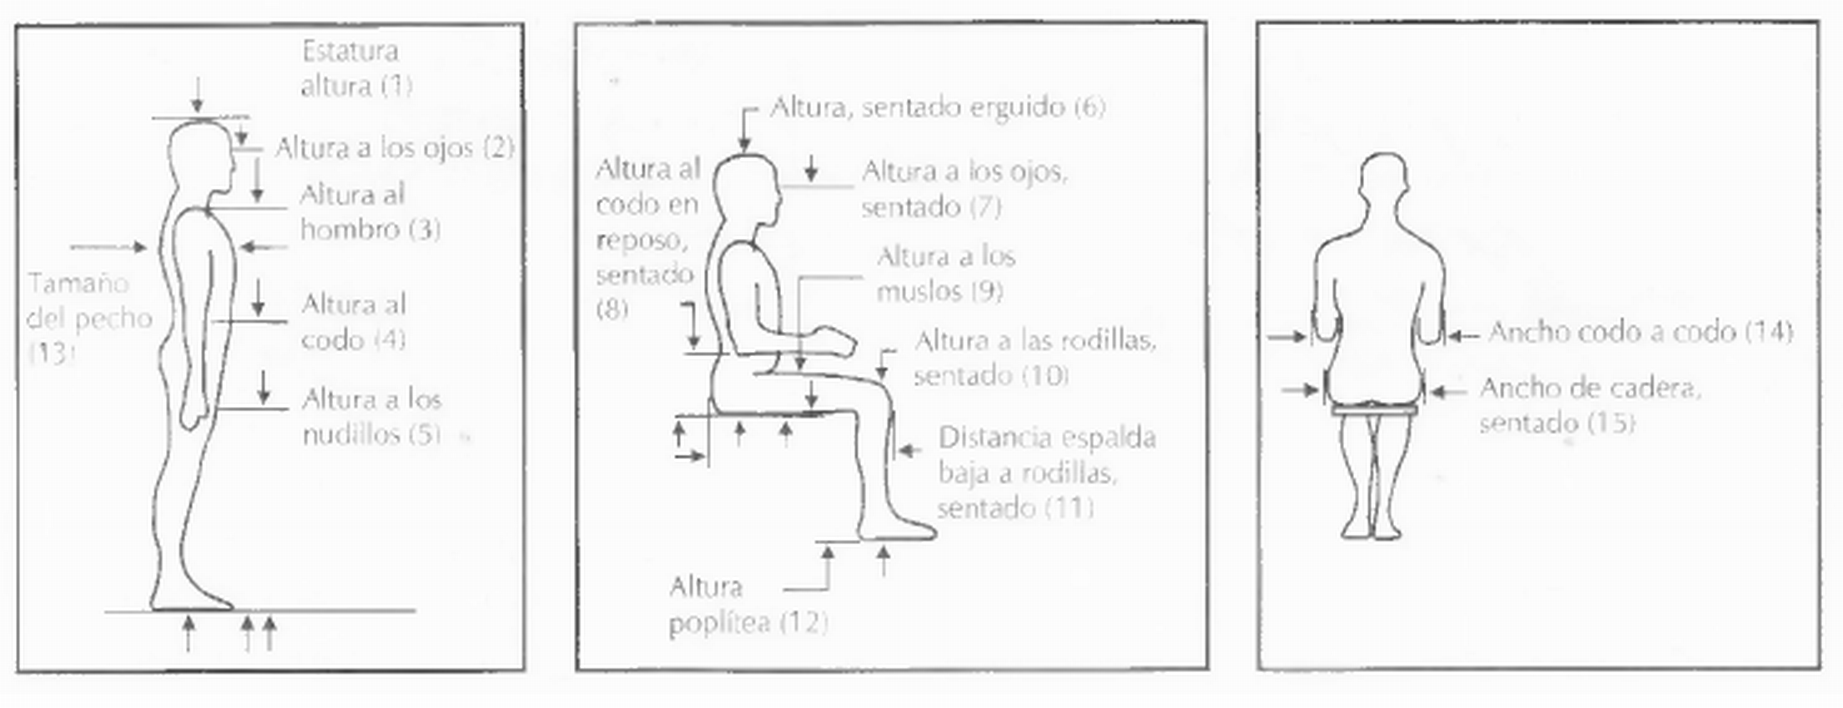 File:Antropometria.png - Wikimedia Commons